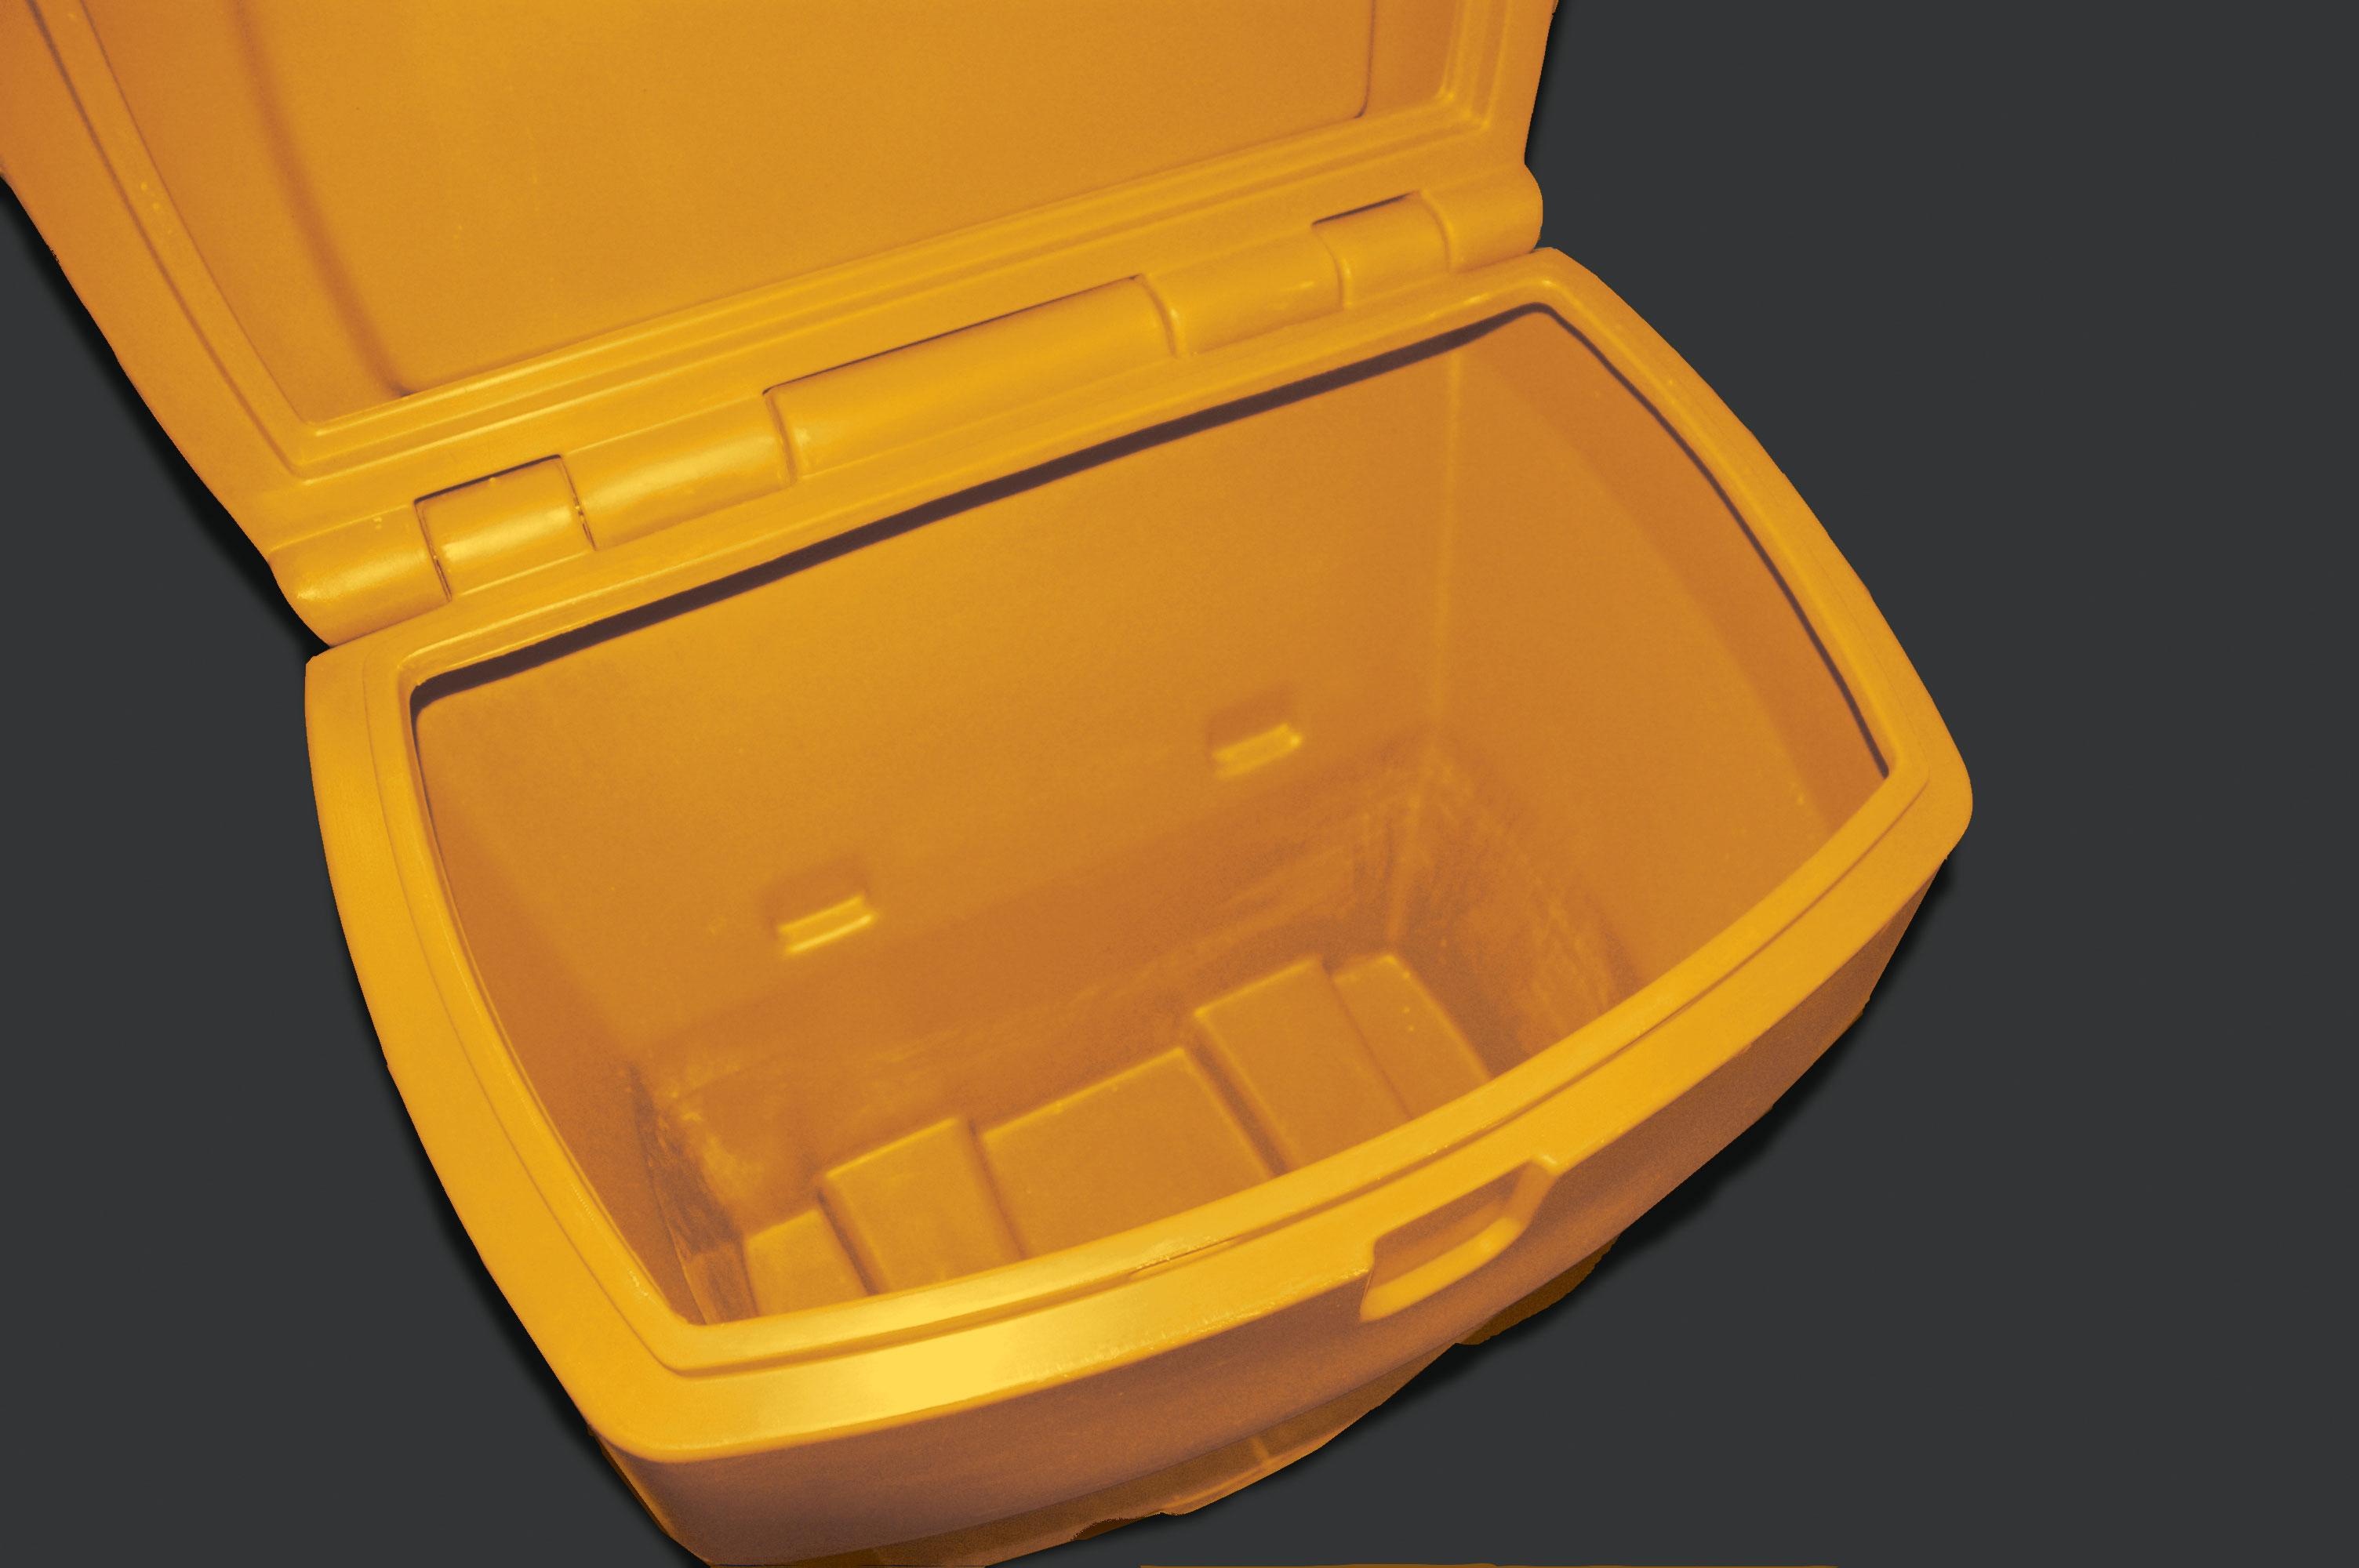 meyer big yellow salt box big yellow box opened 2